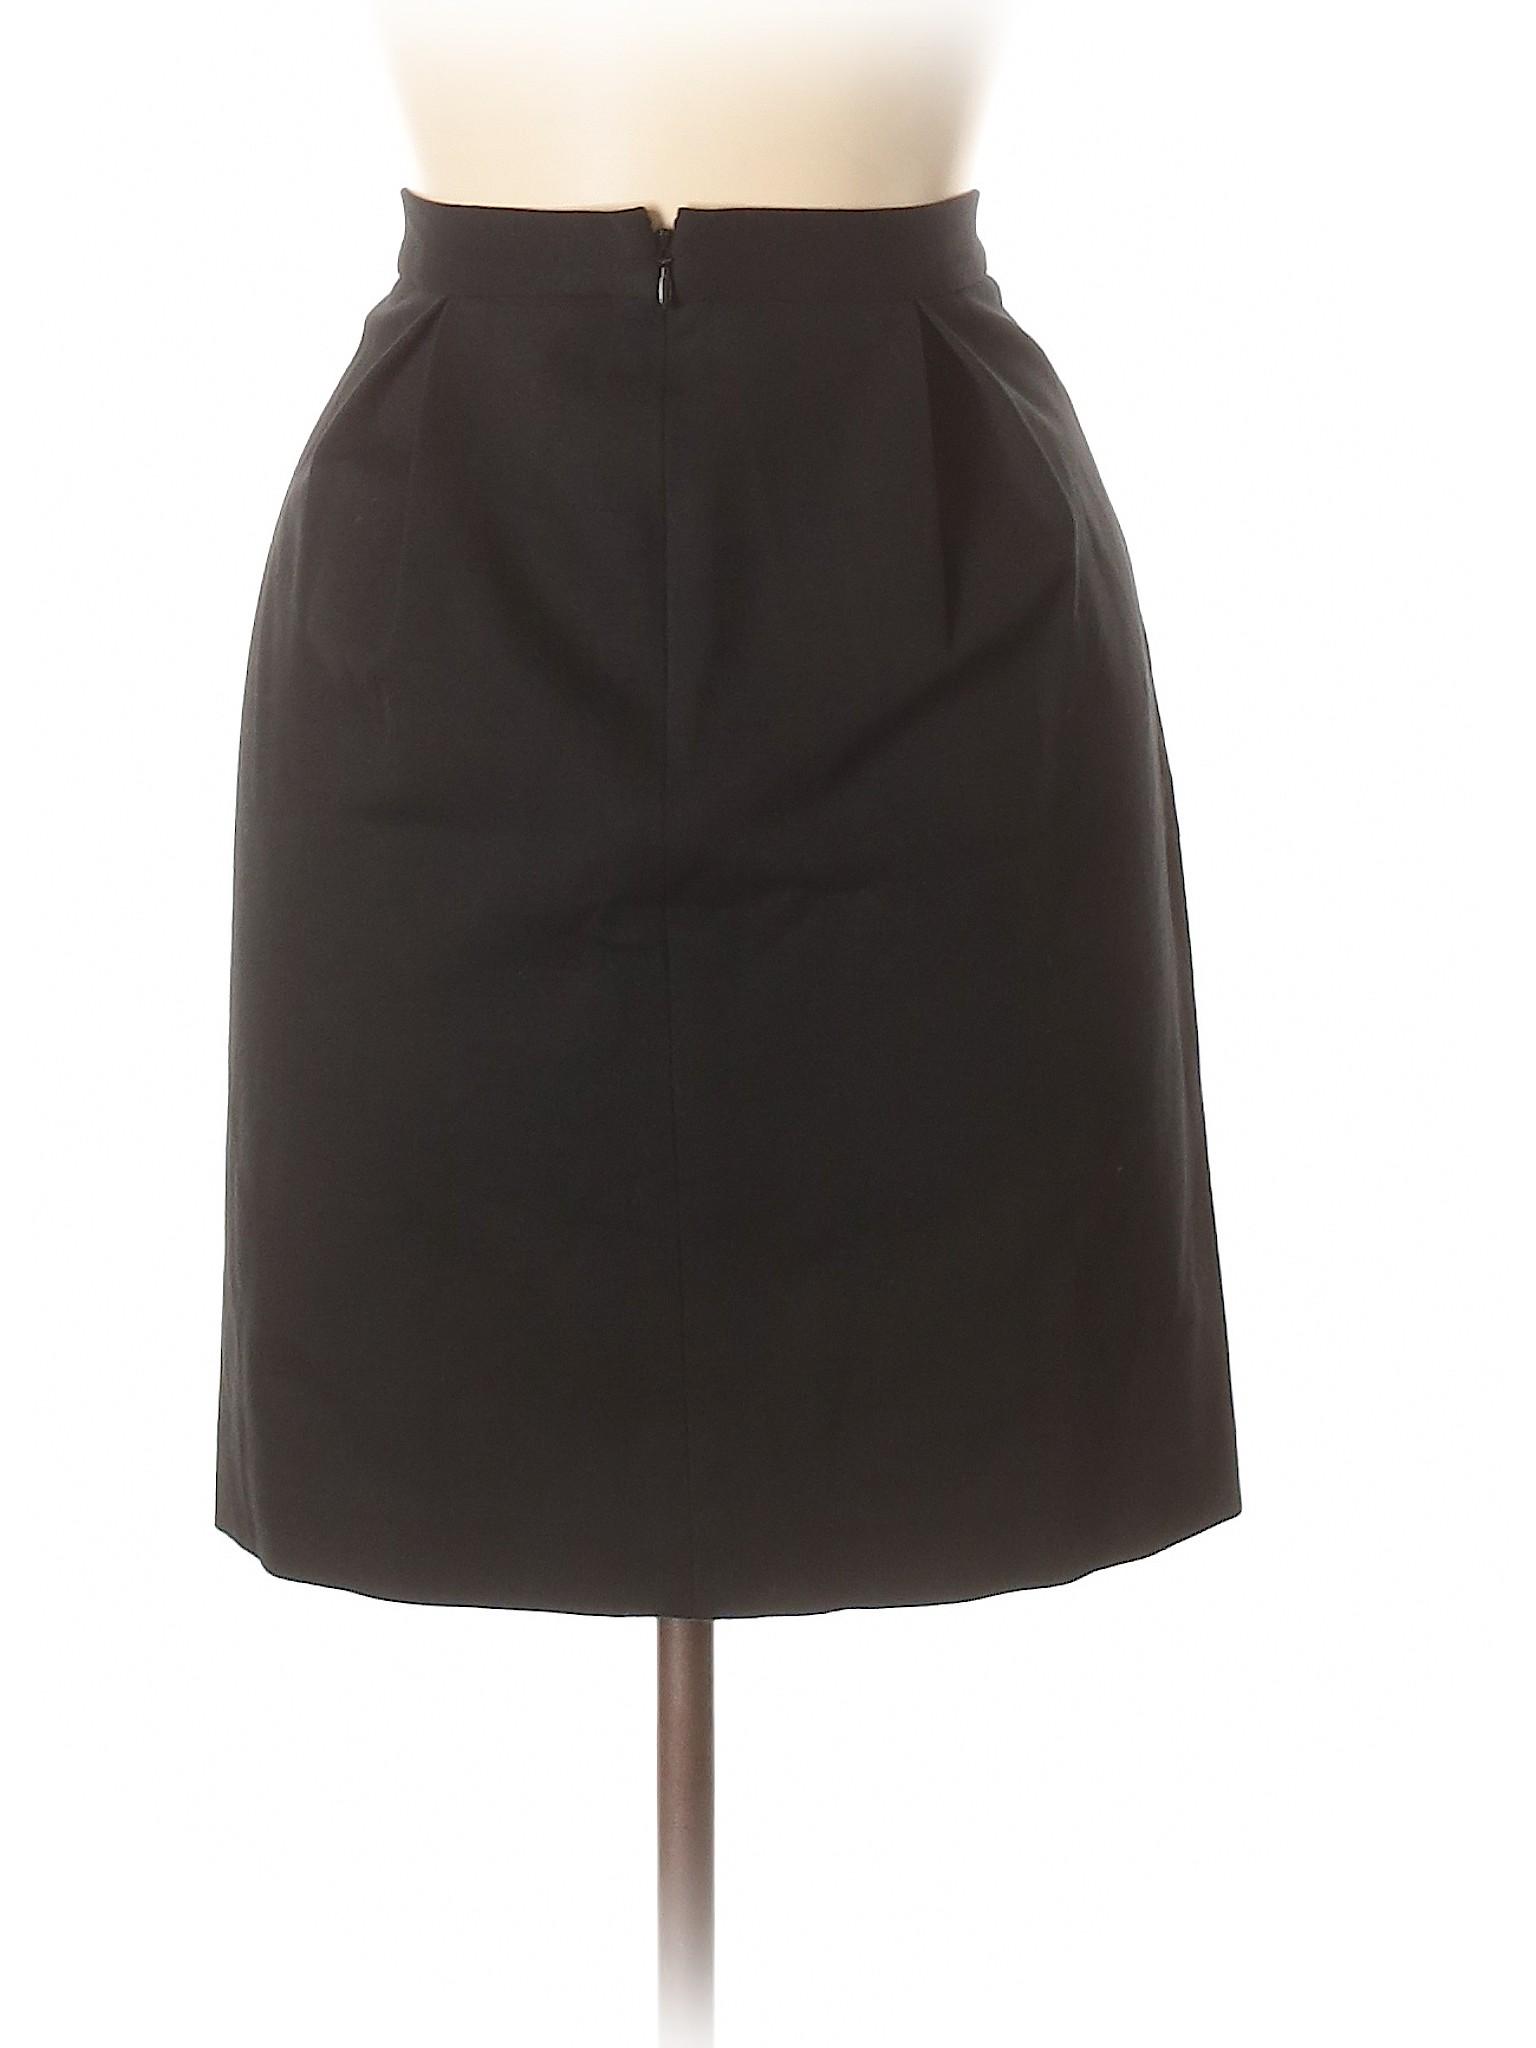 Casual Boutique Skirt Boutique Skirt Casual Boutique Skirt Casual Boutique Skirt Casual 4qxgxzwR